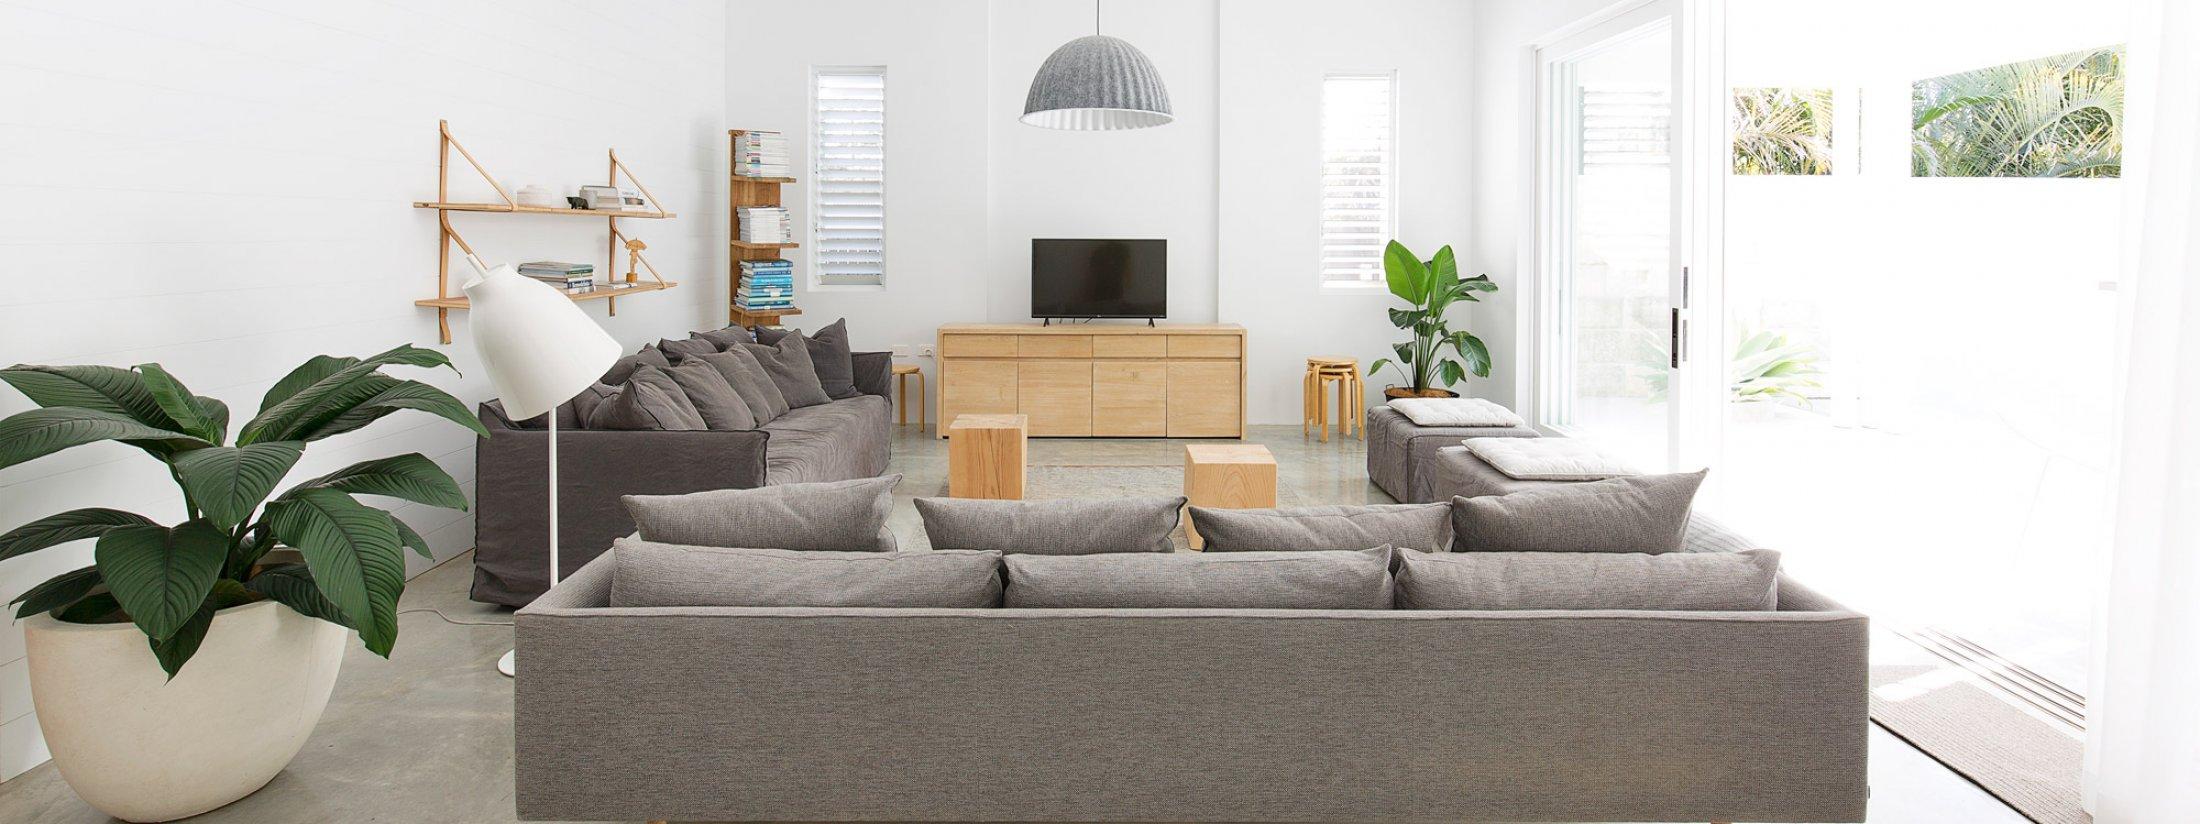 Coonanga Beach House - Avalon - Lounge